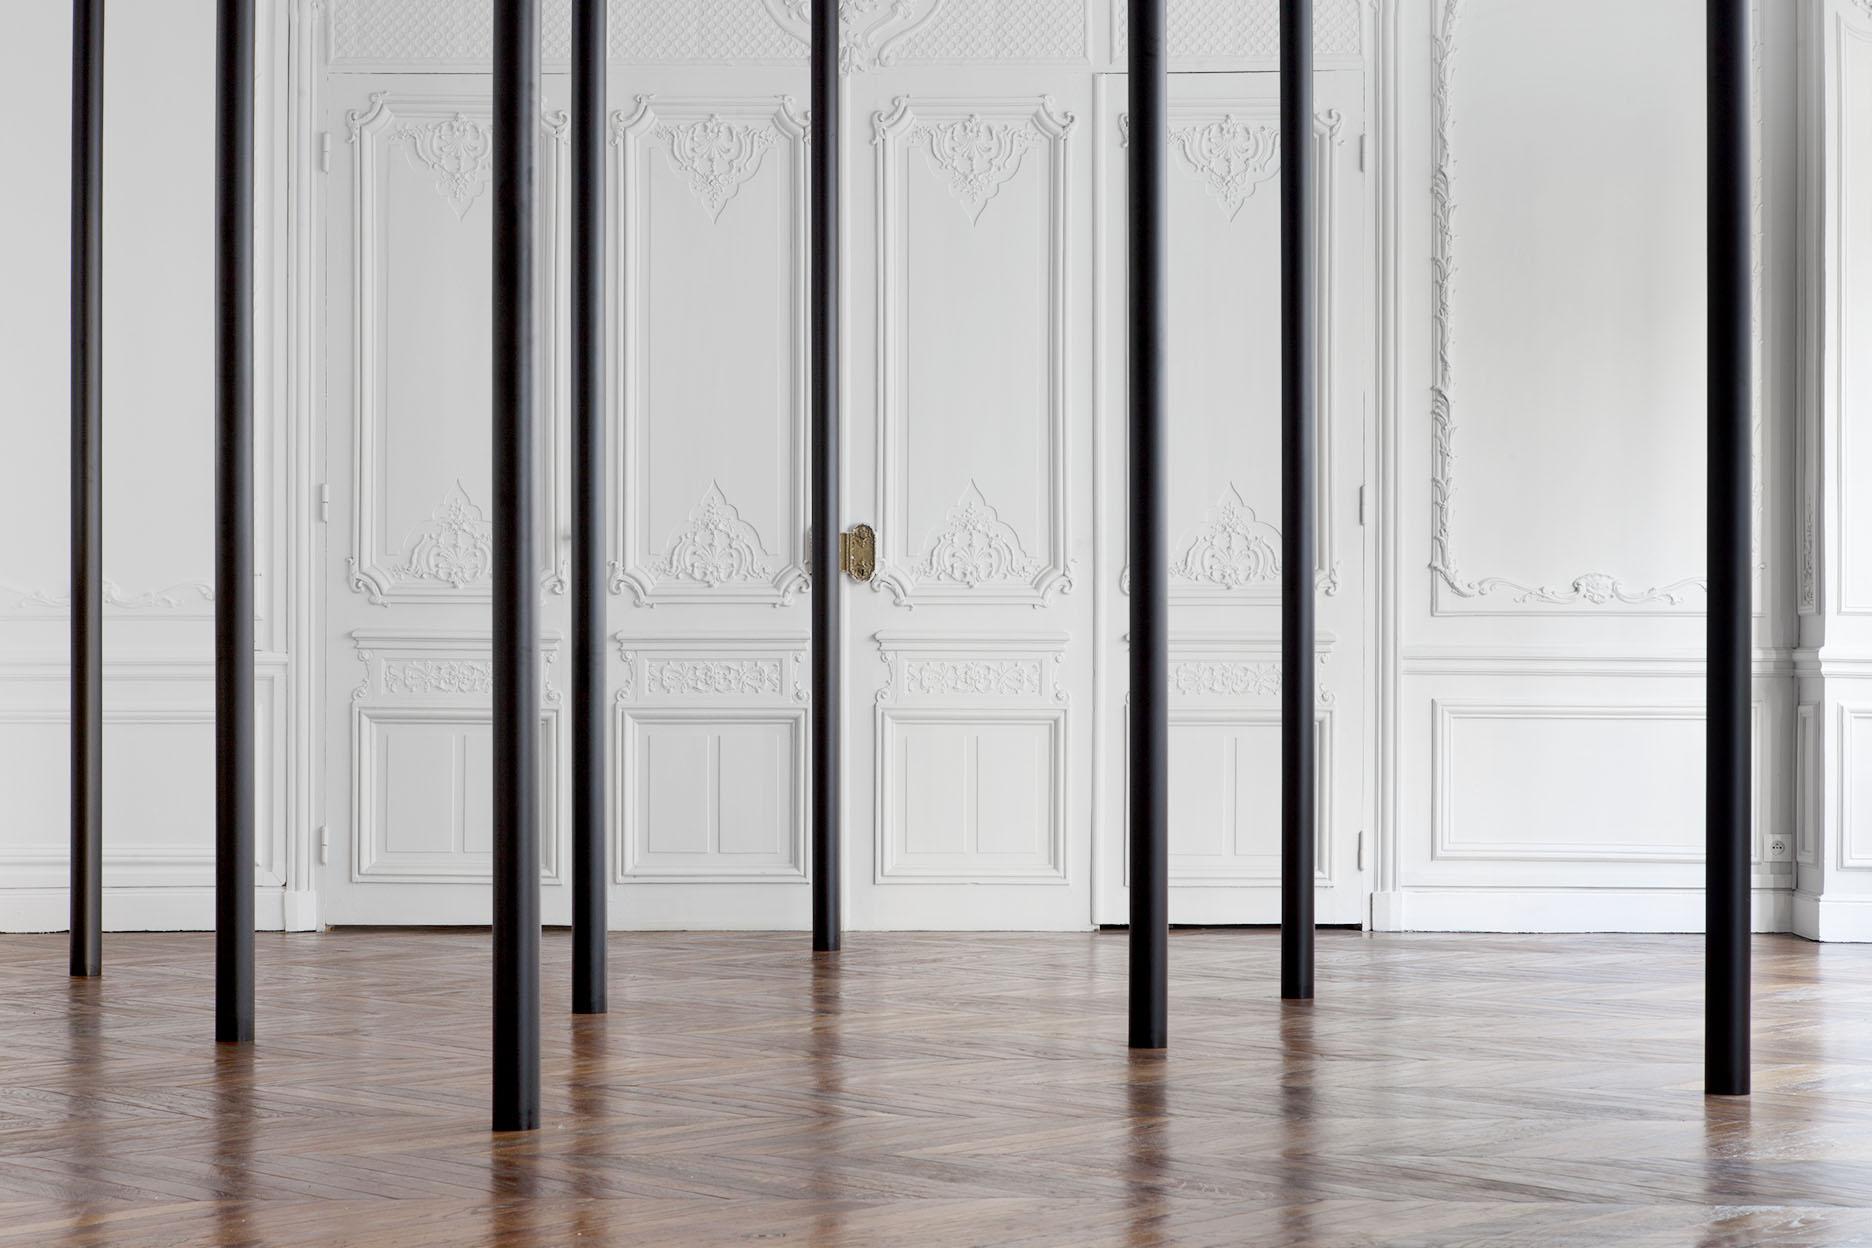 Berger&Berger, Galerie Rosascape, Paris, 2011